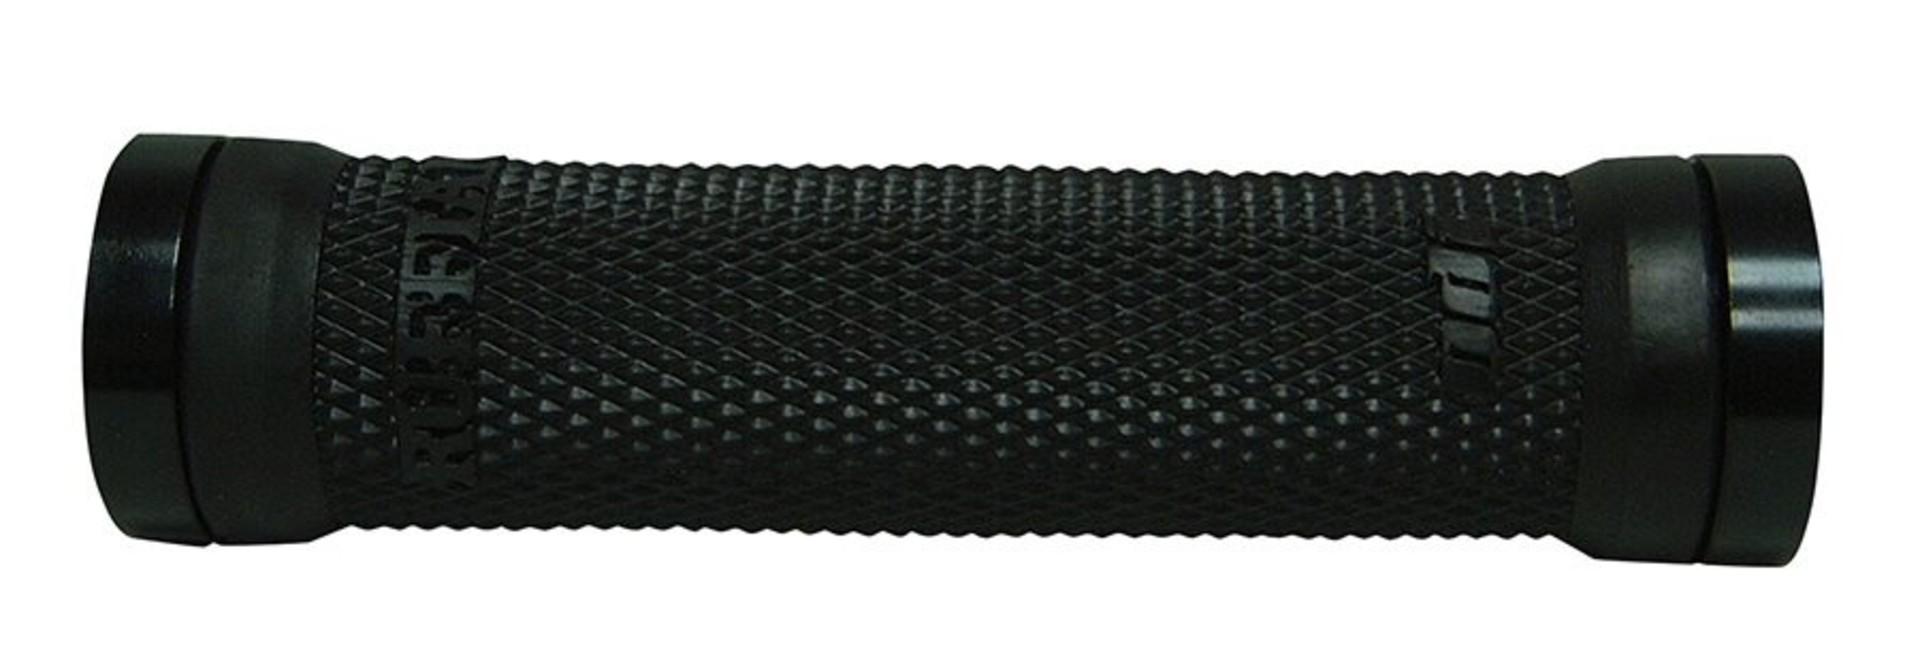 ODI, Ruffian, Grips, 130mm, Black/Grey, Pair